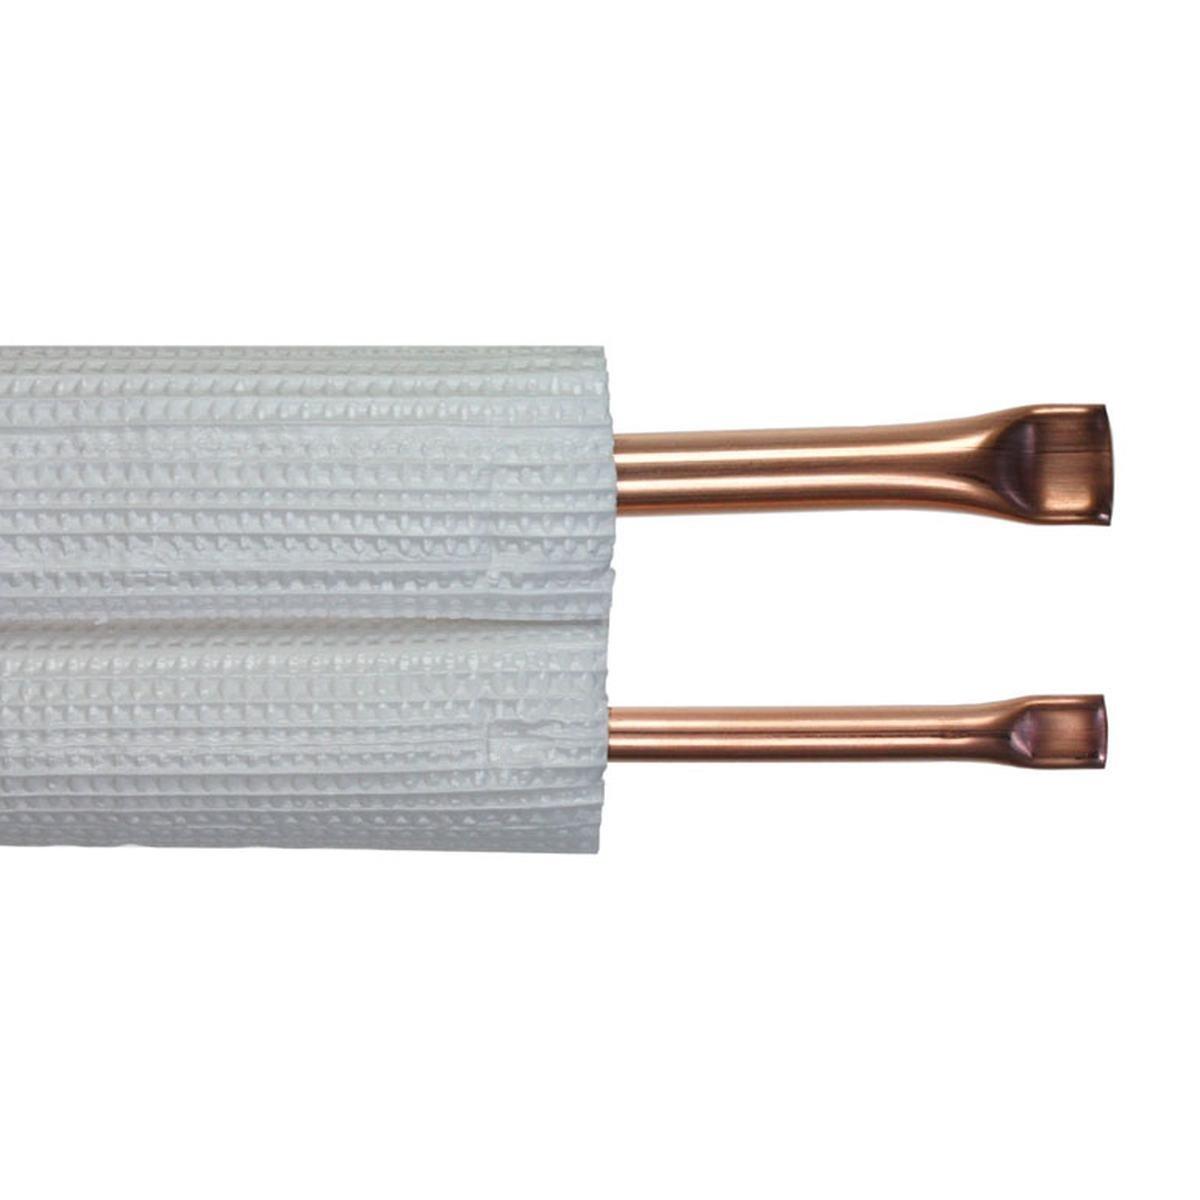 "Kopparrör isolerad dubbel 1/4""+1/2"" x 0,8 mm. 20 m"